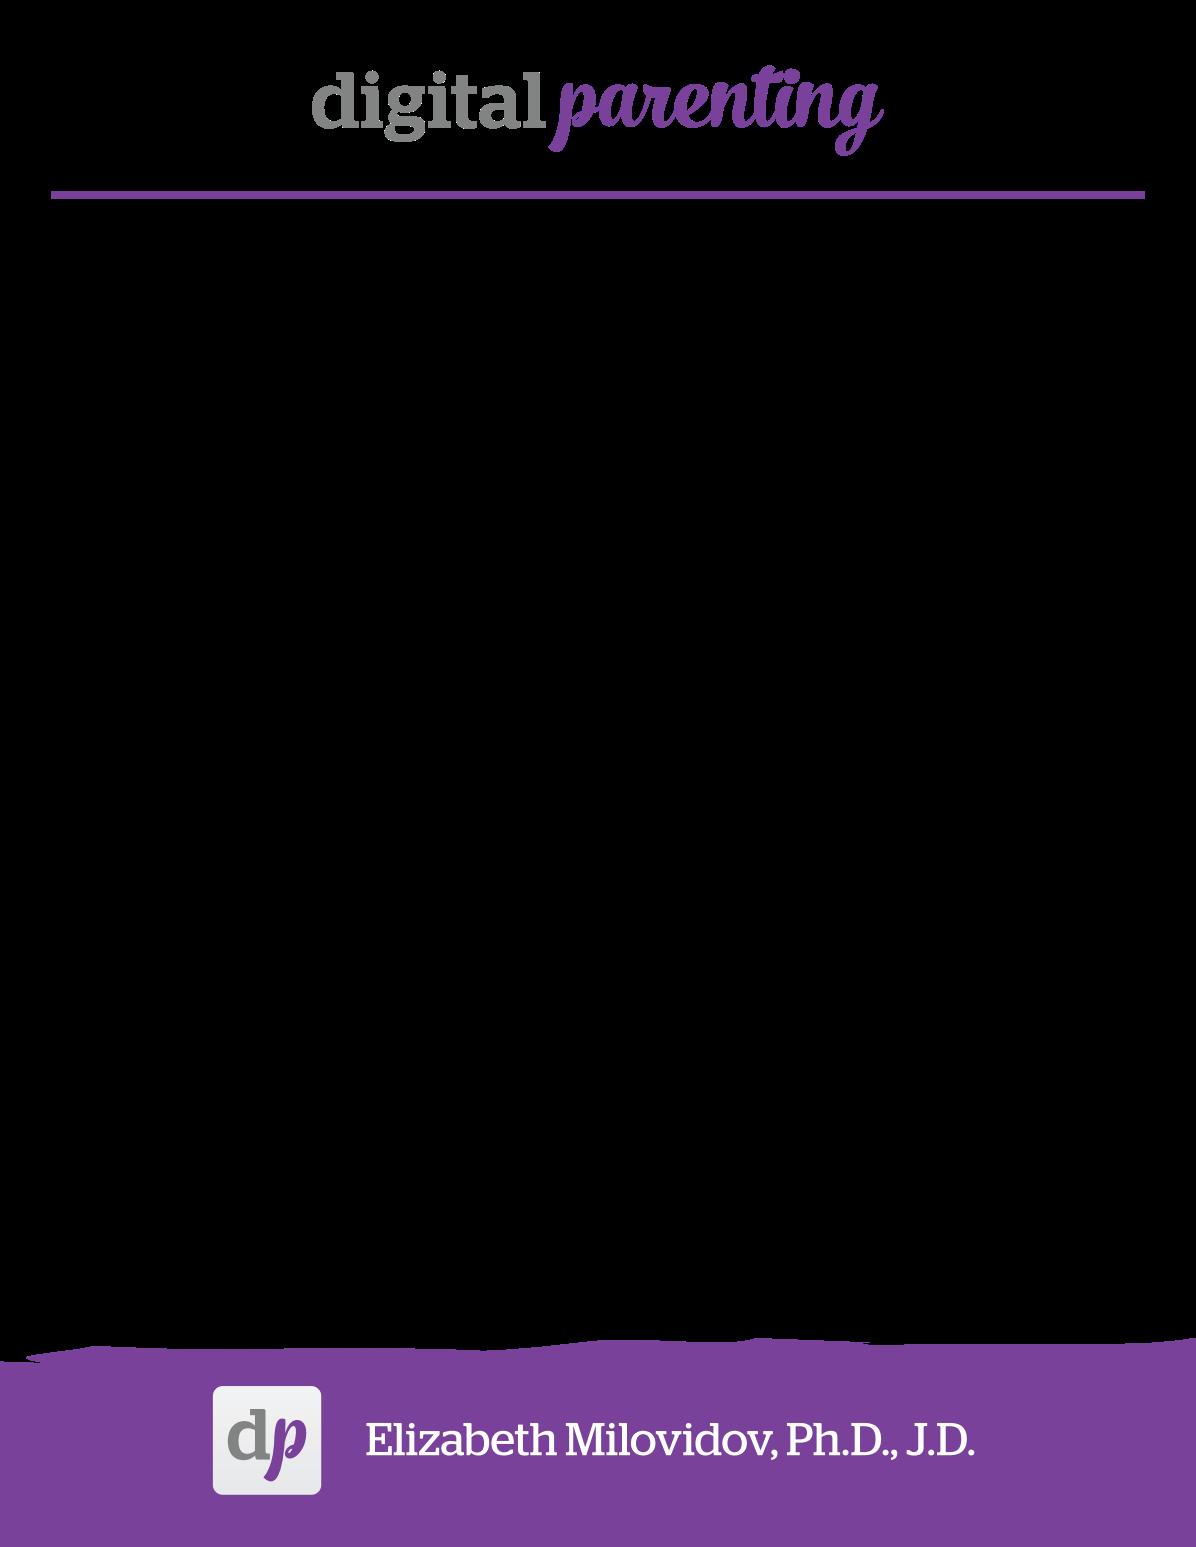 Logo on address labels / post-its